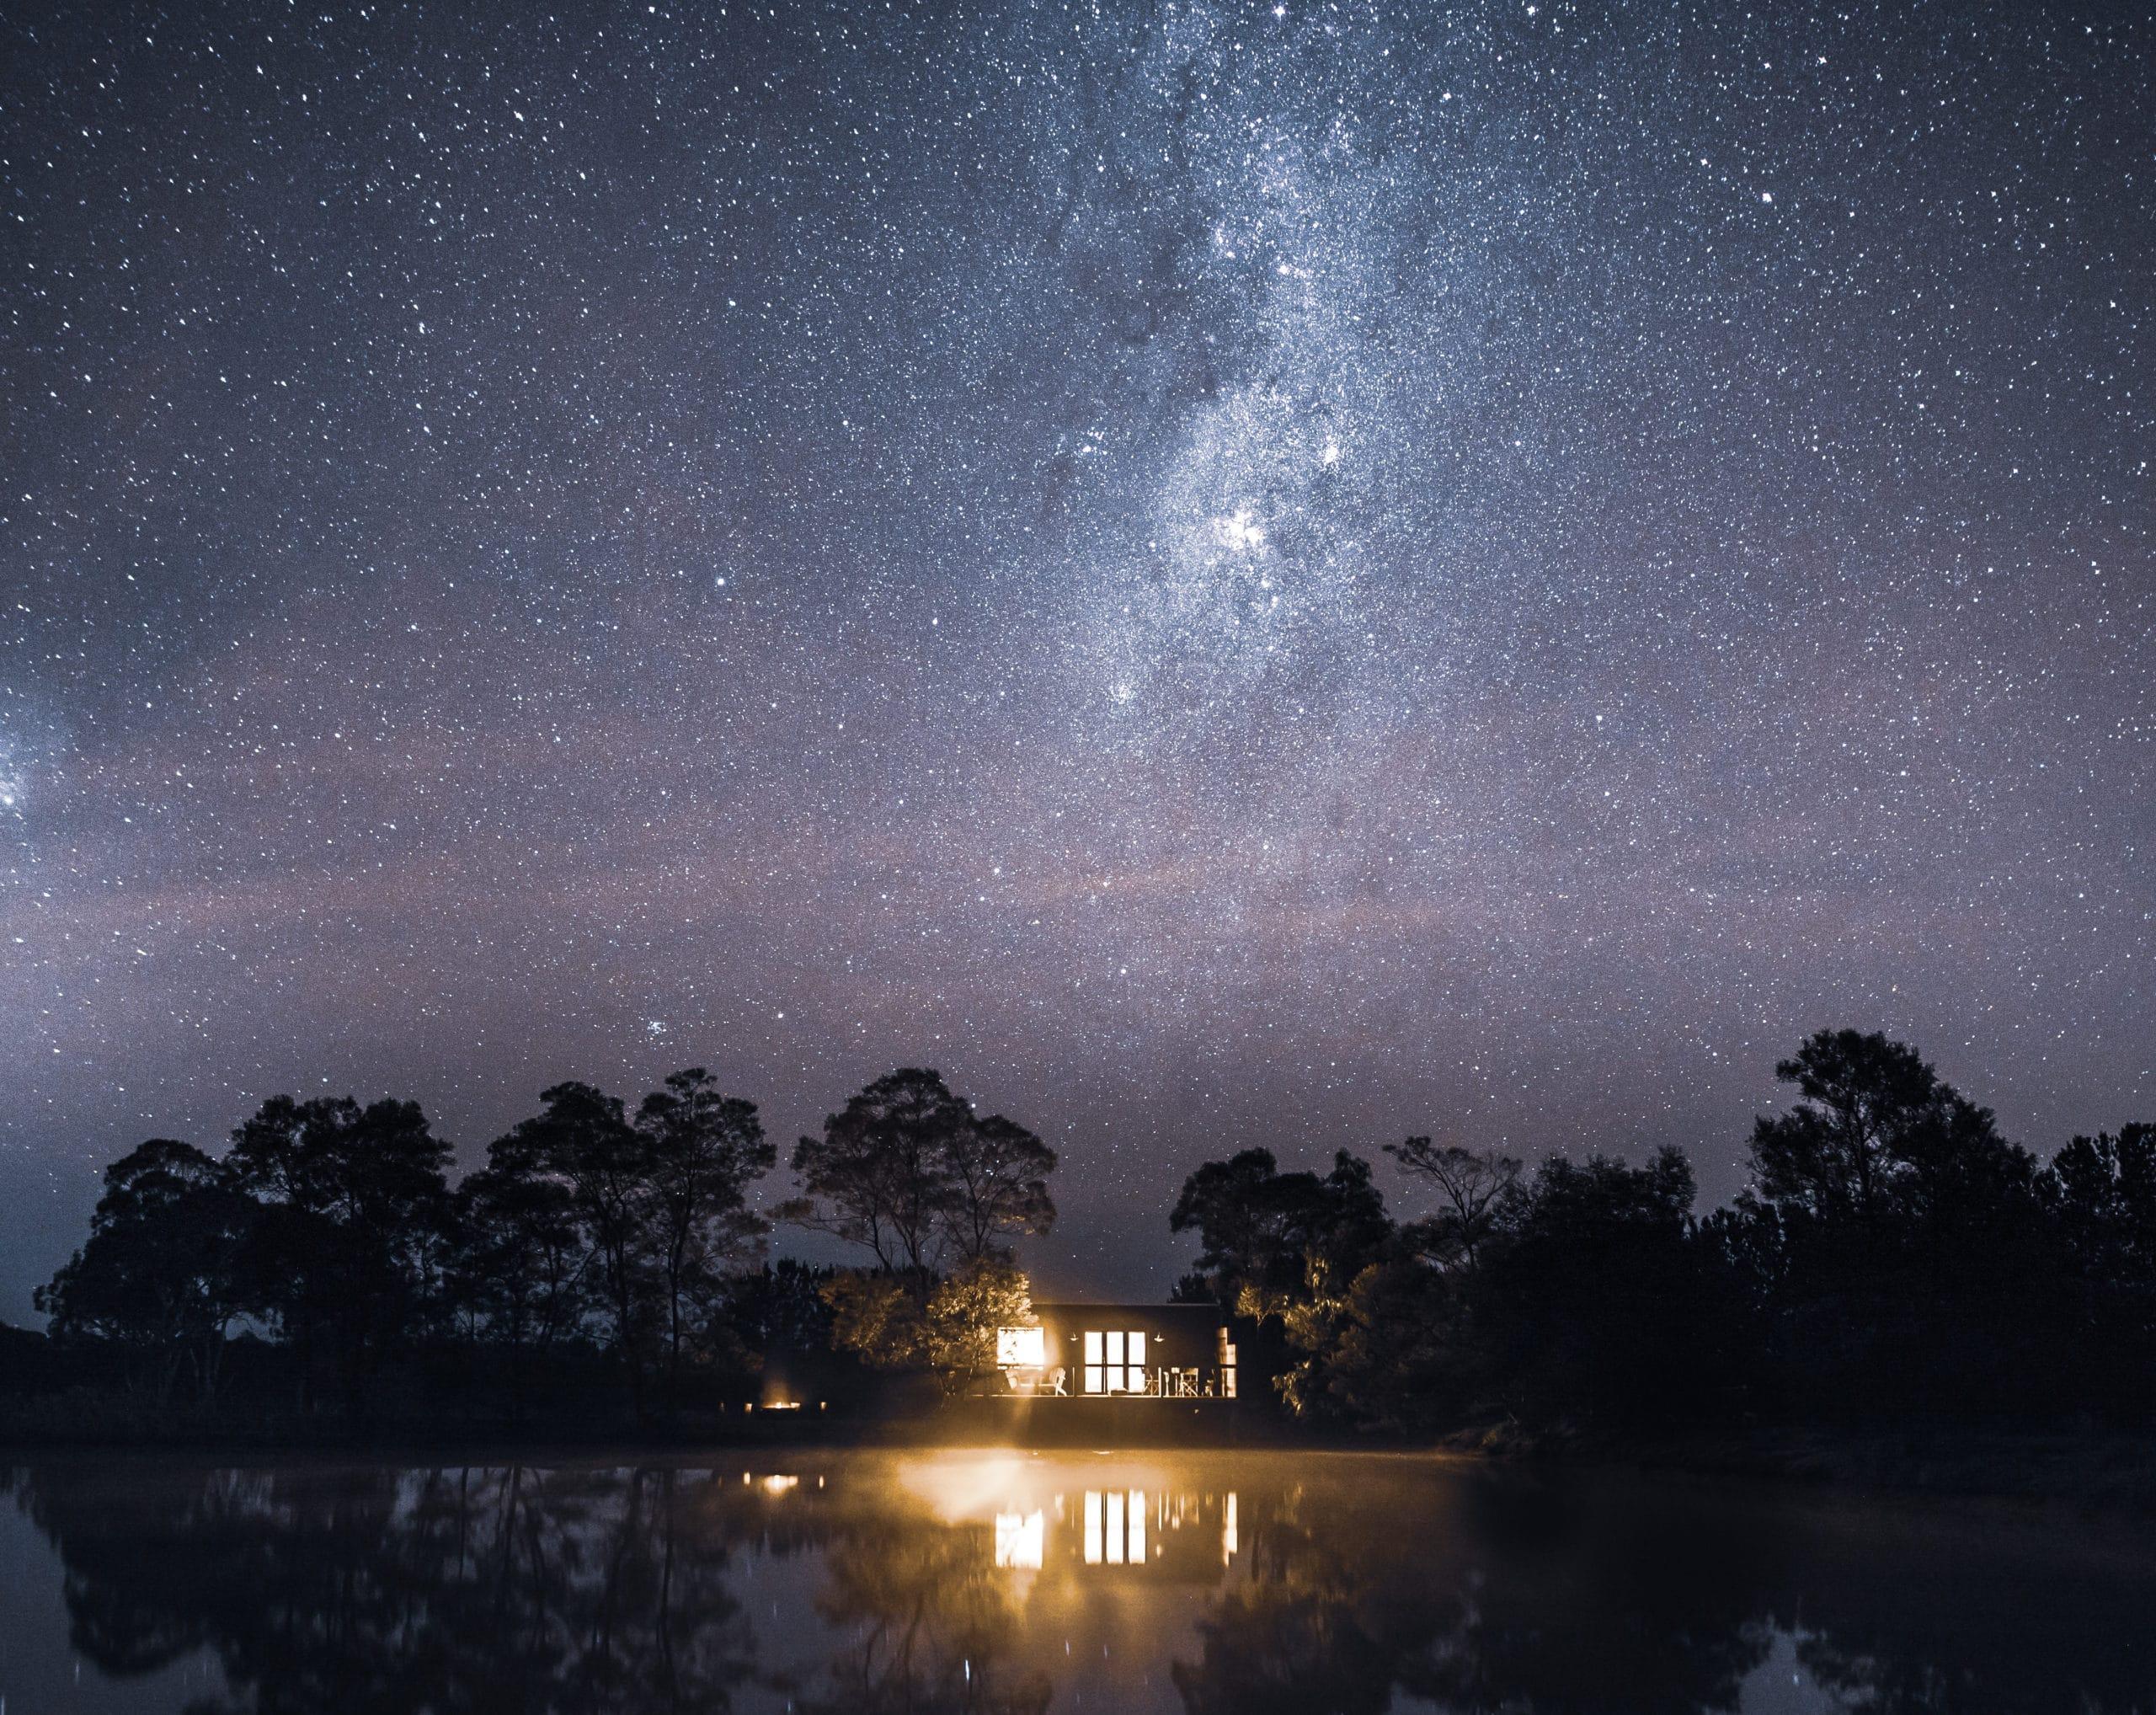 Hideout starry sky